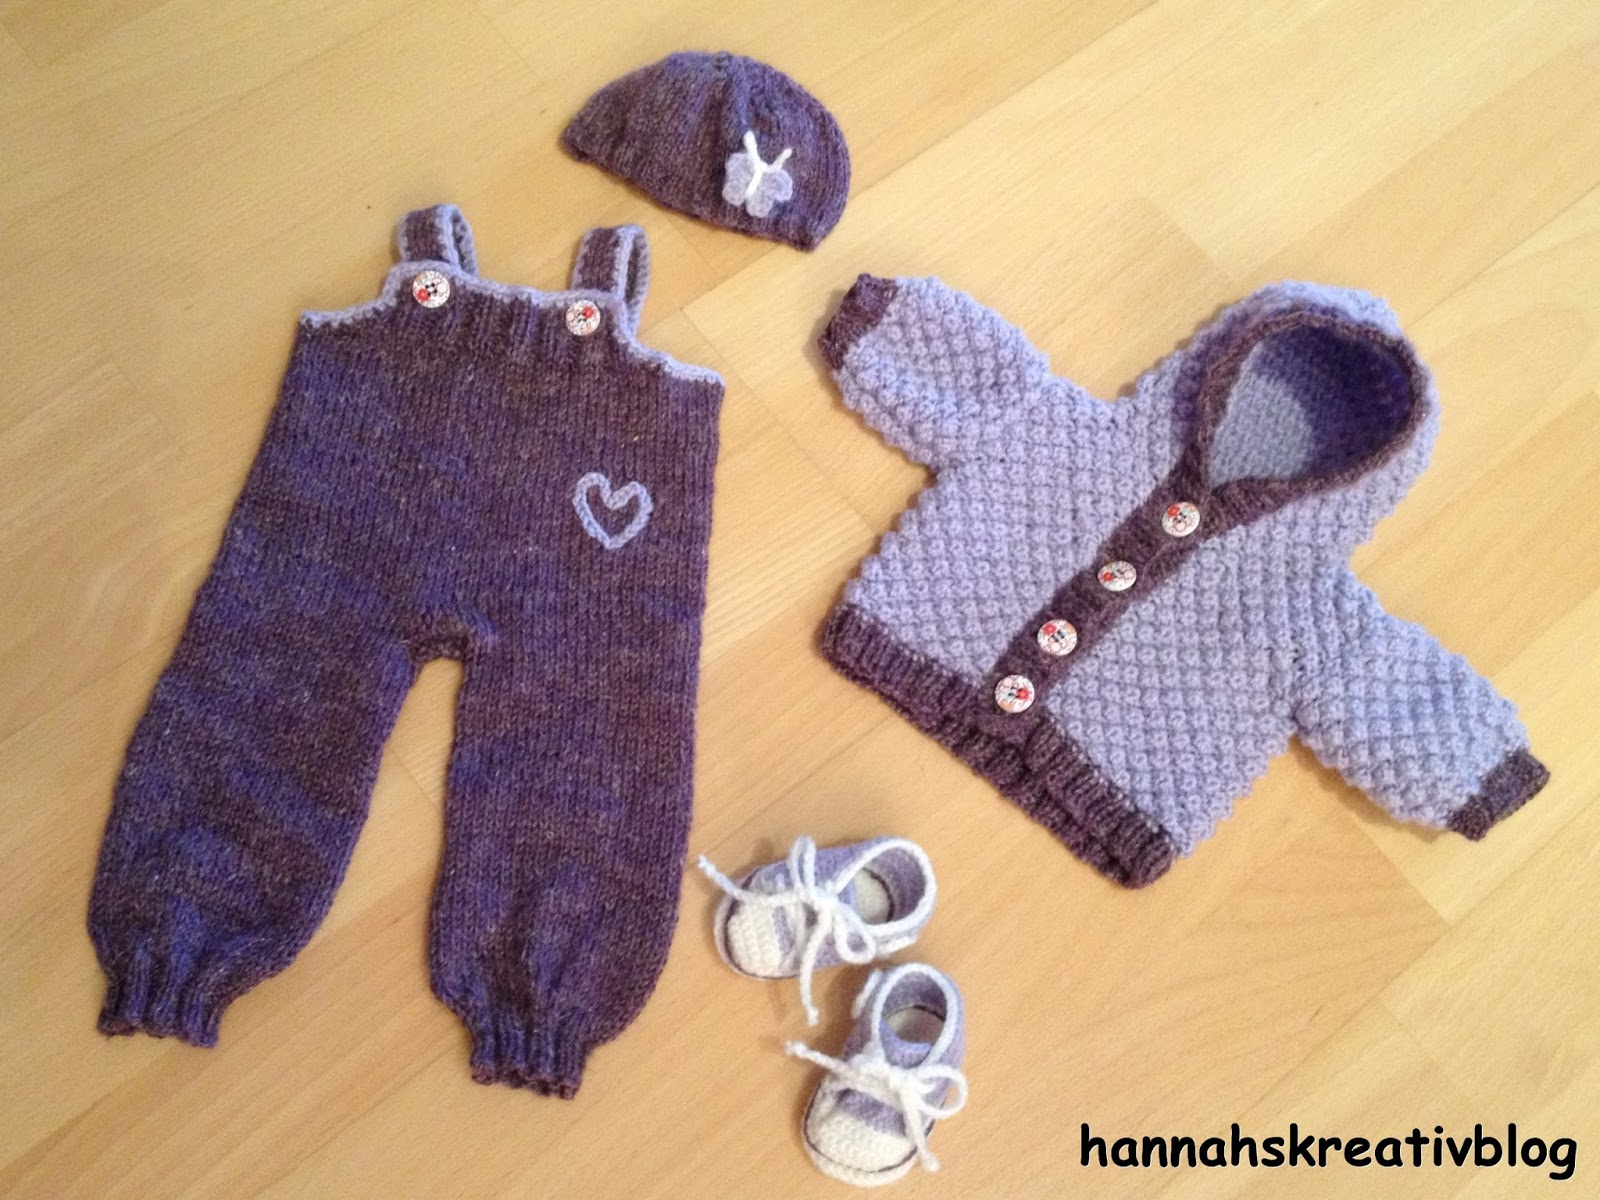 Hannahs Kreativblog: Puppenkleidung für Winter